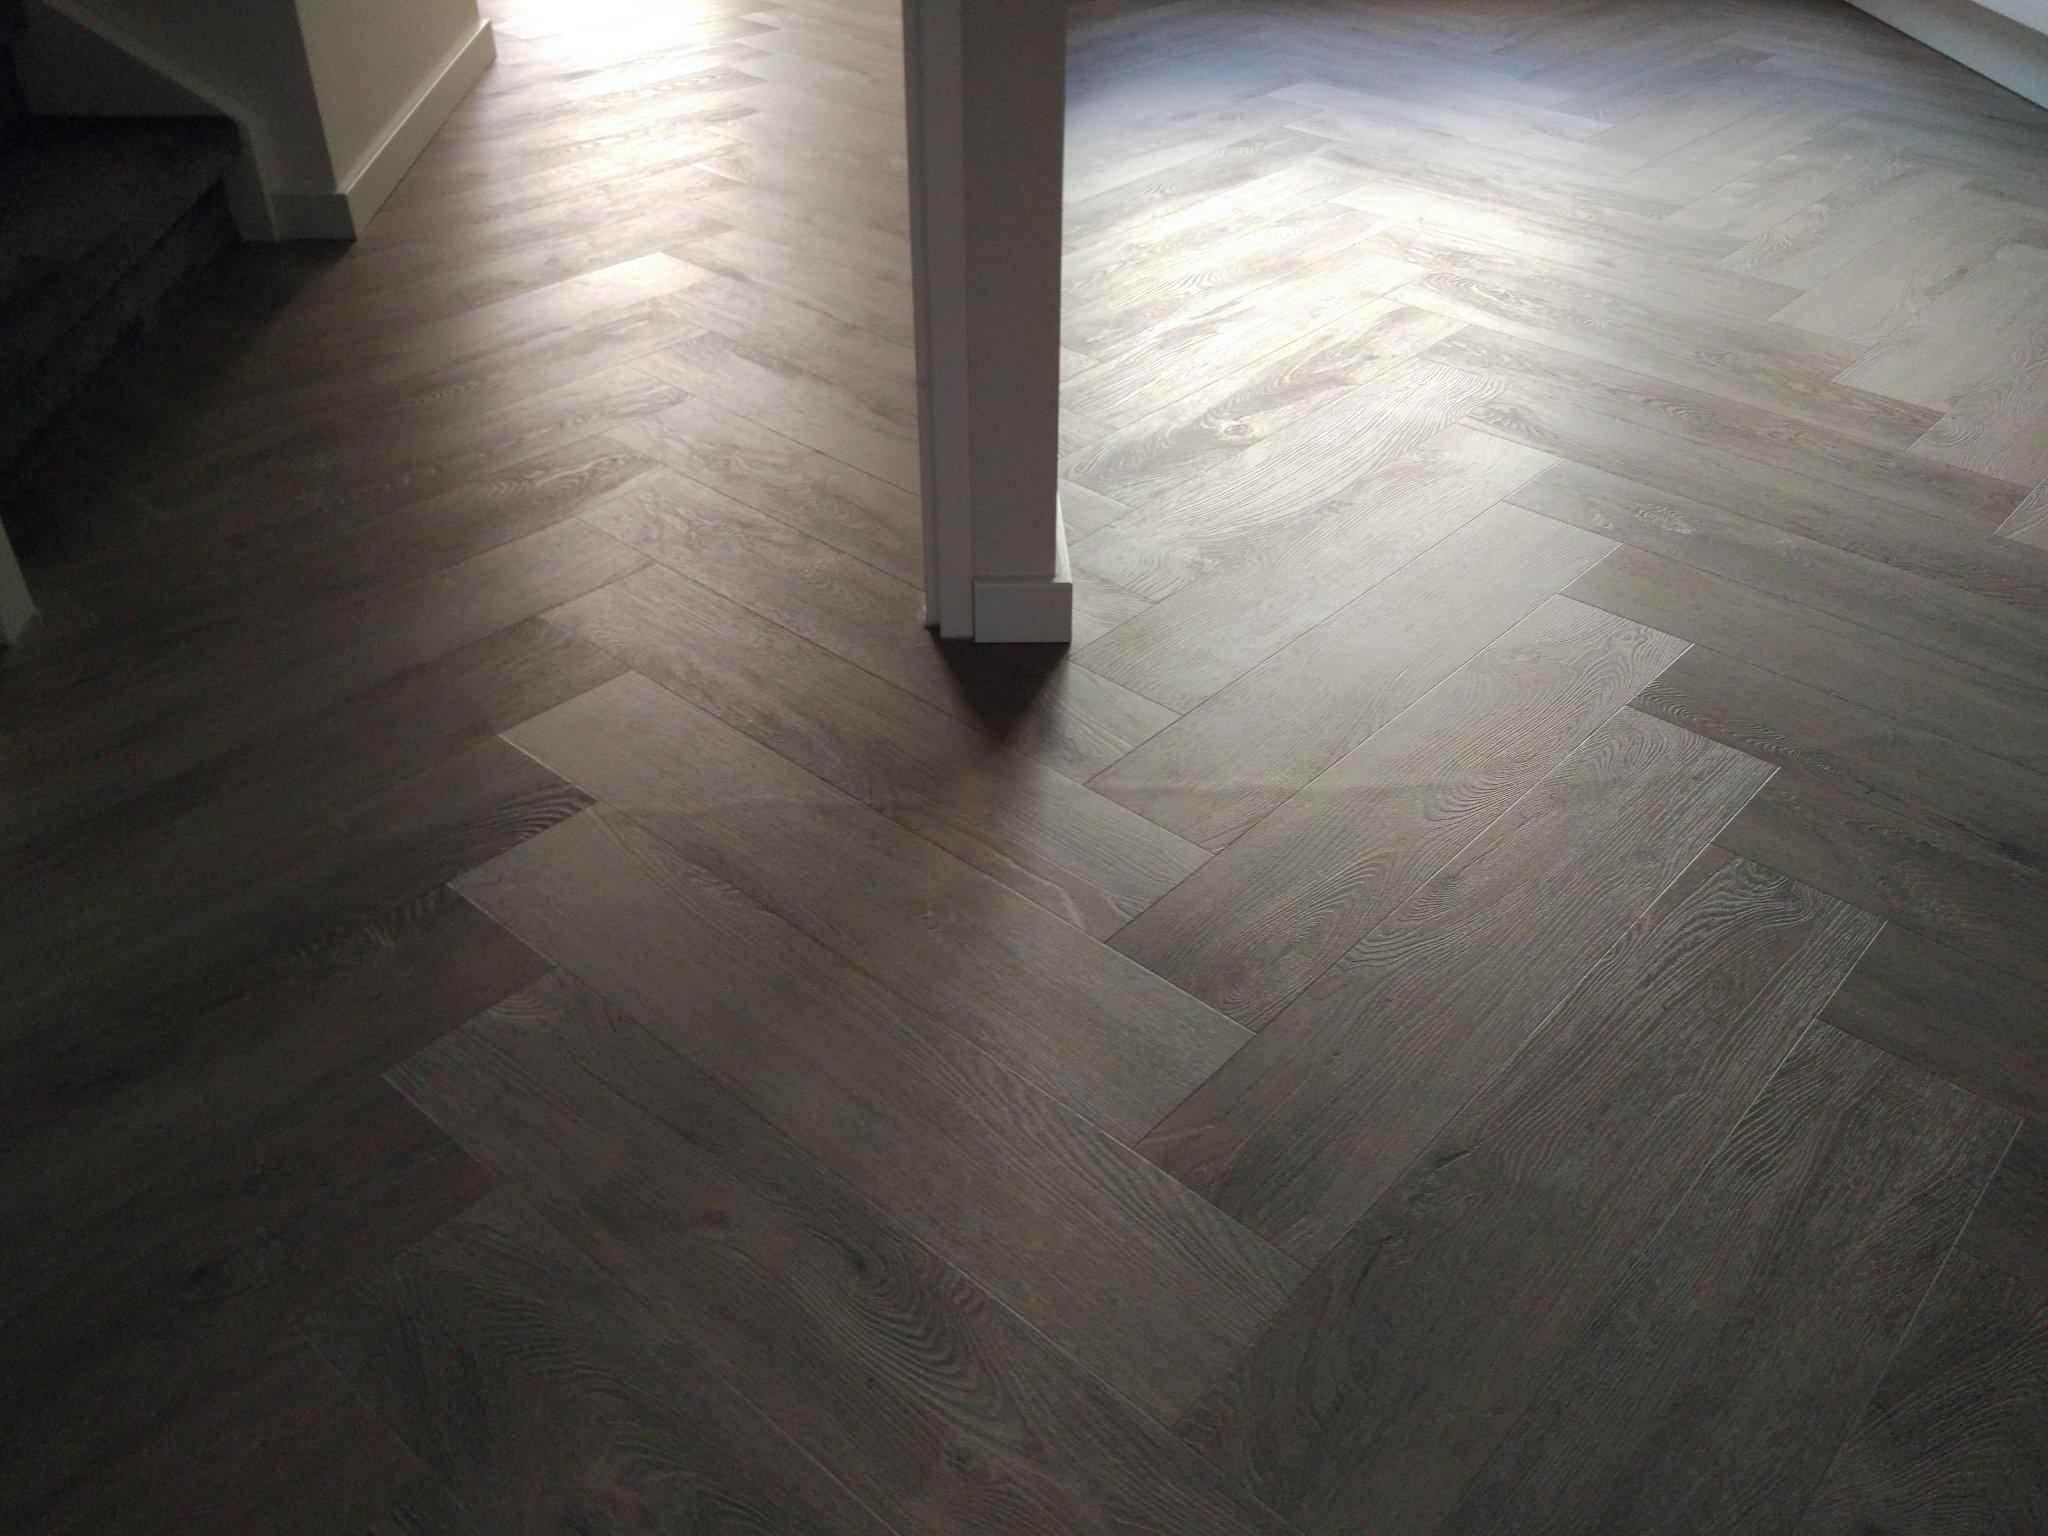 Pvc Vloer Herstellen : Pvc vloer repareren werkspot